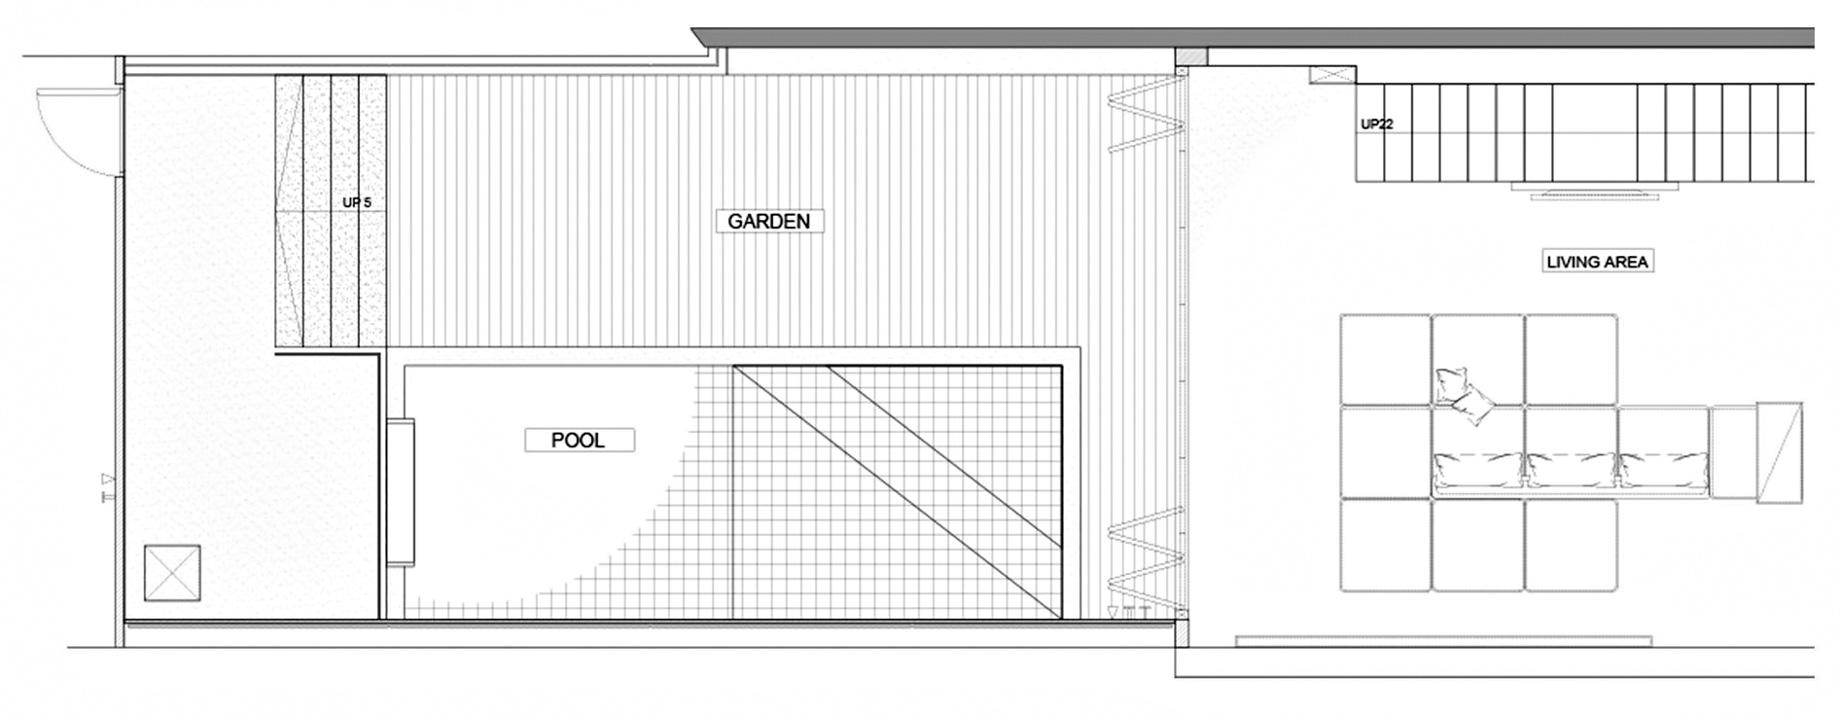 Floor Plans – Sai Kung Luxury Residence – New Territories, Hong Kong, China